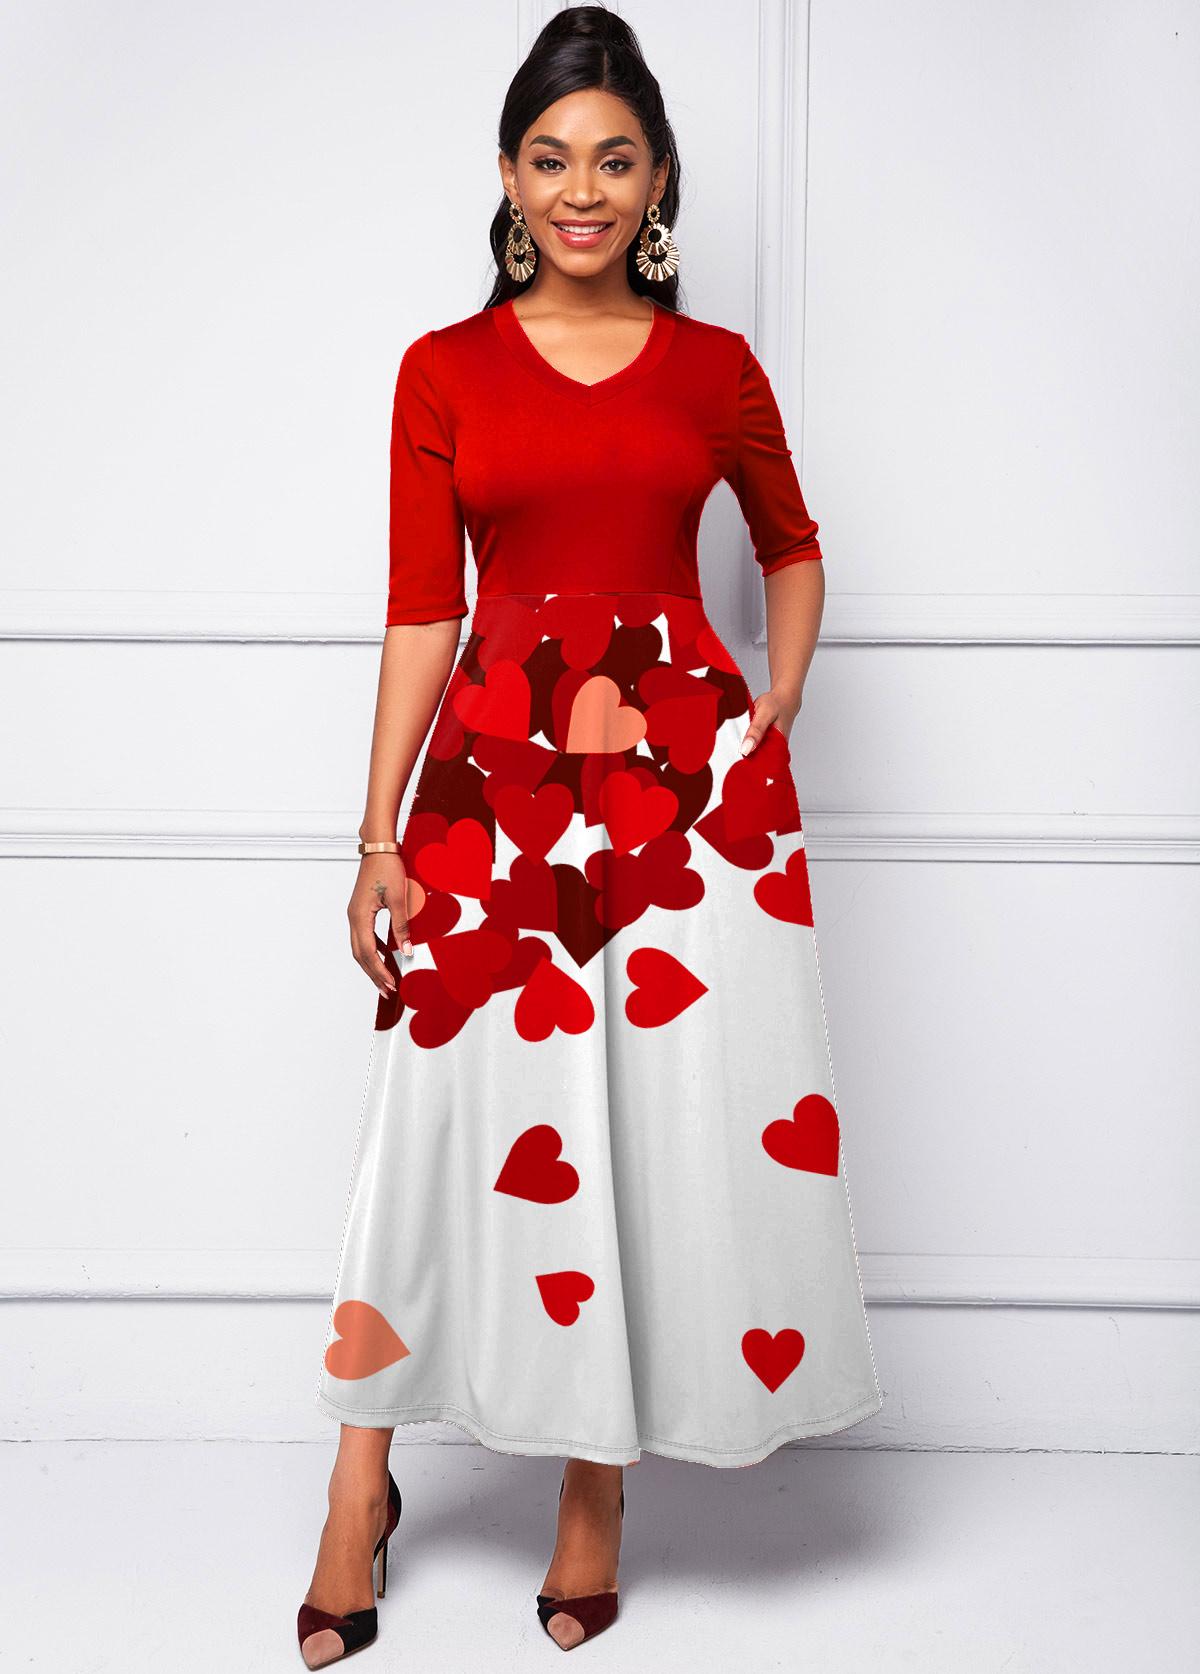 Heart Print Gradient Half Sleeve Dress